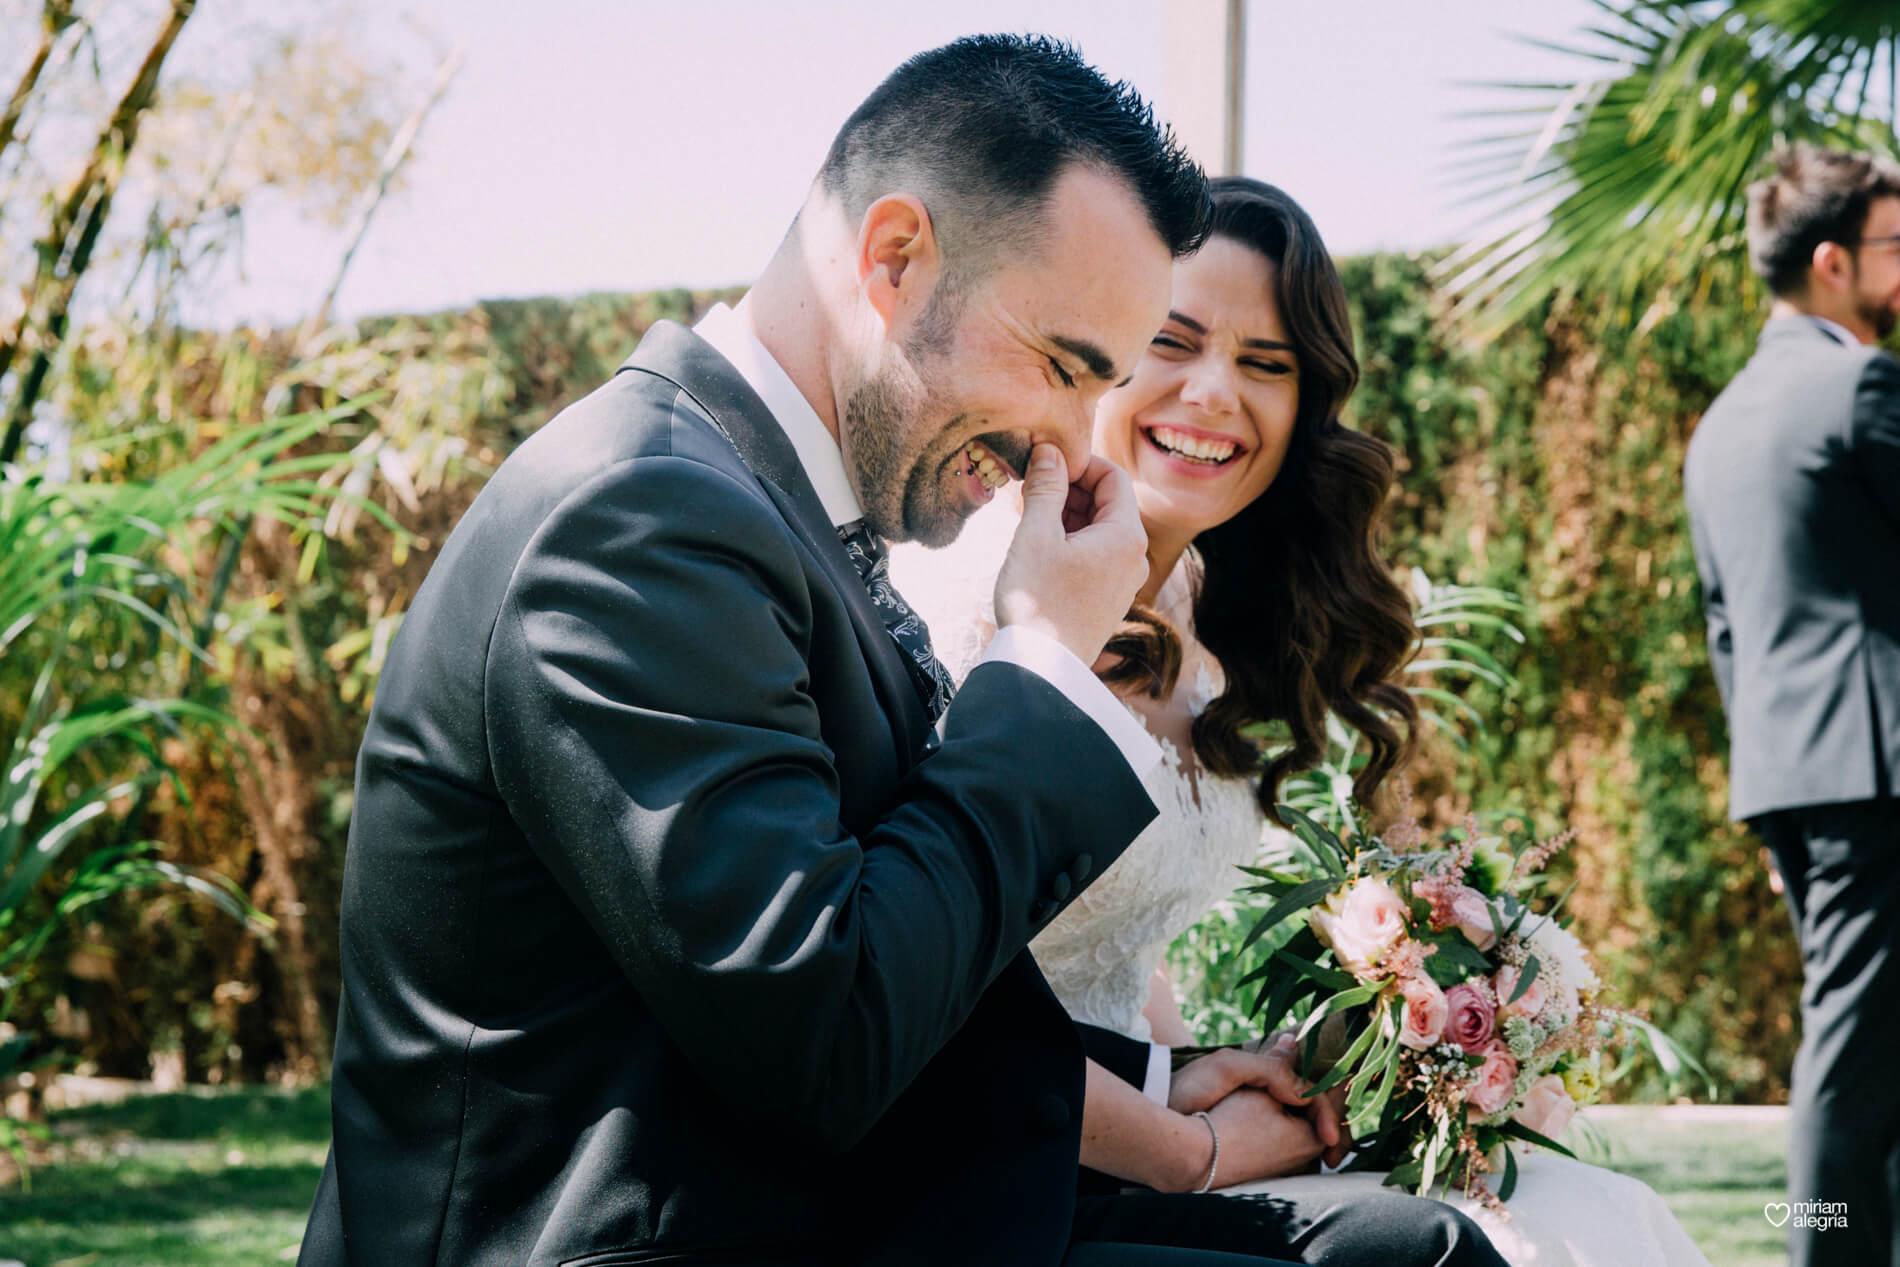 boda-en-finca-jurosa-miriam-alegria-55